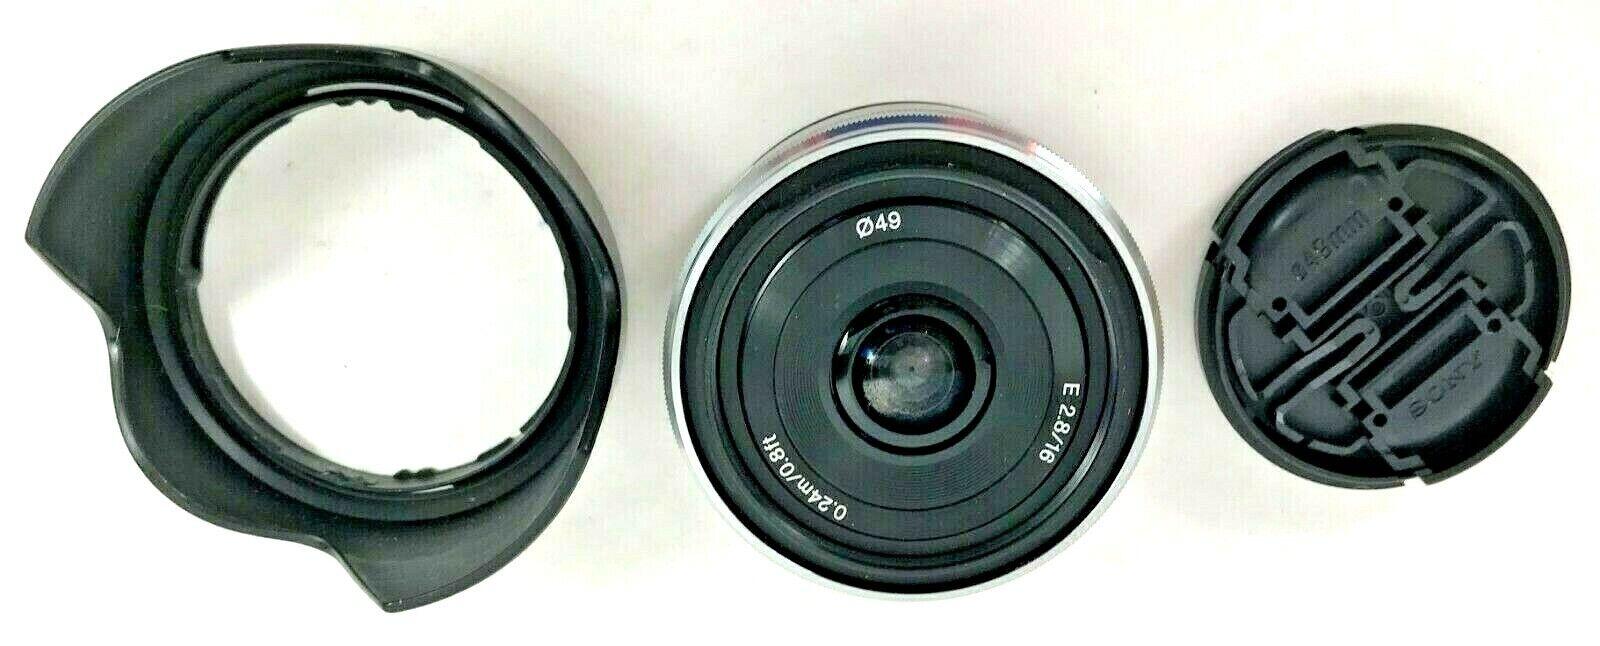 Sony Camera Lens Sel16f28 Interchangeable E Mount E2.8/16 0.24m/0.8ft/ 049 - $142.00